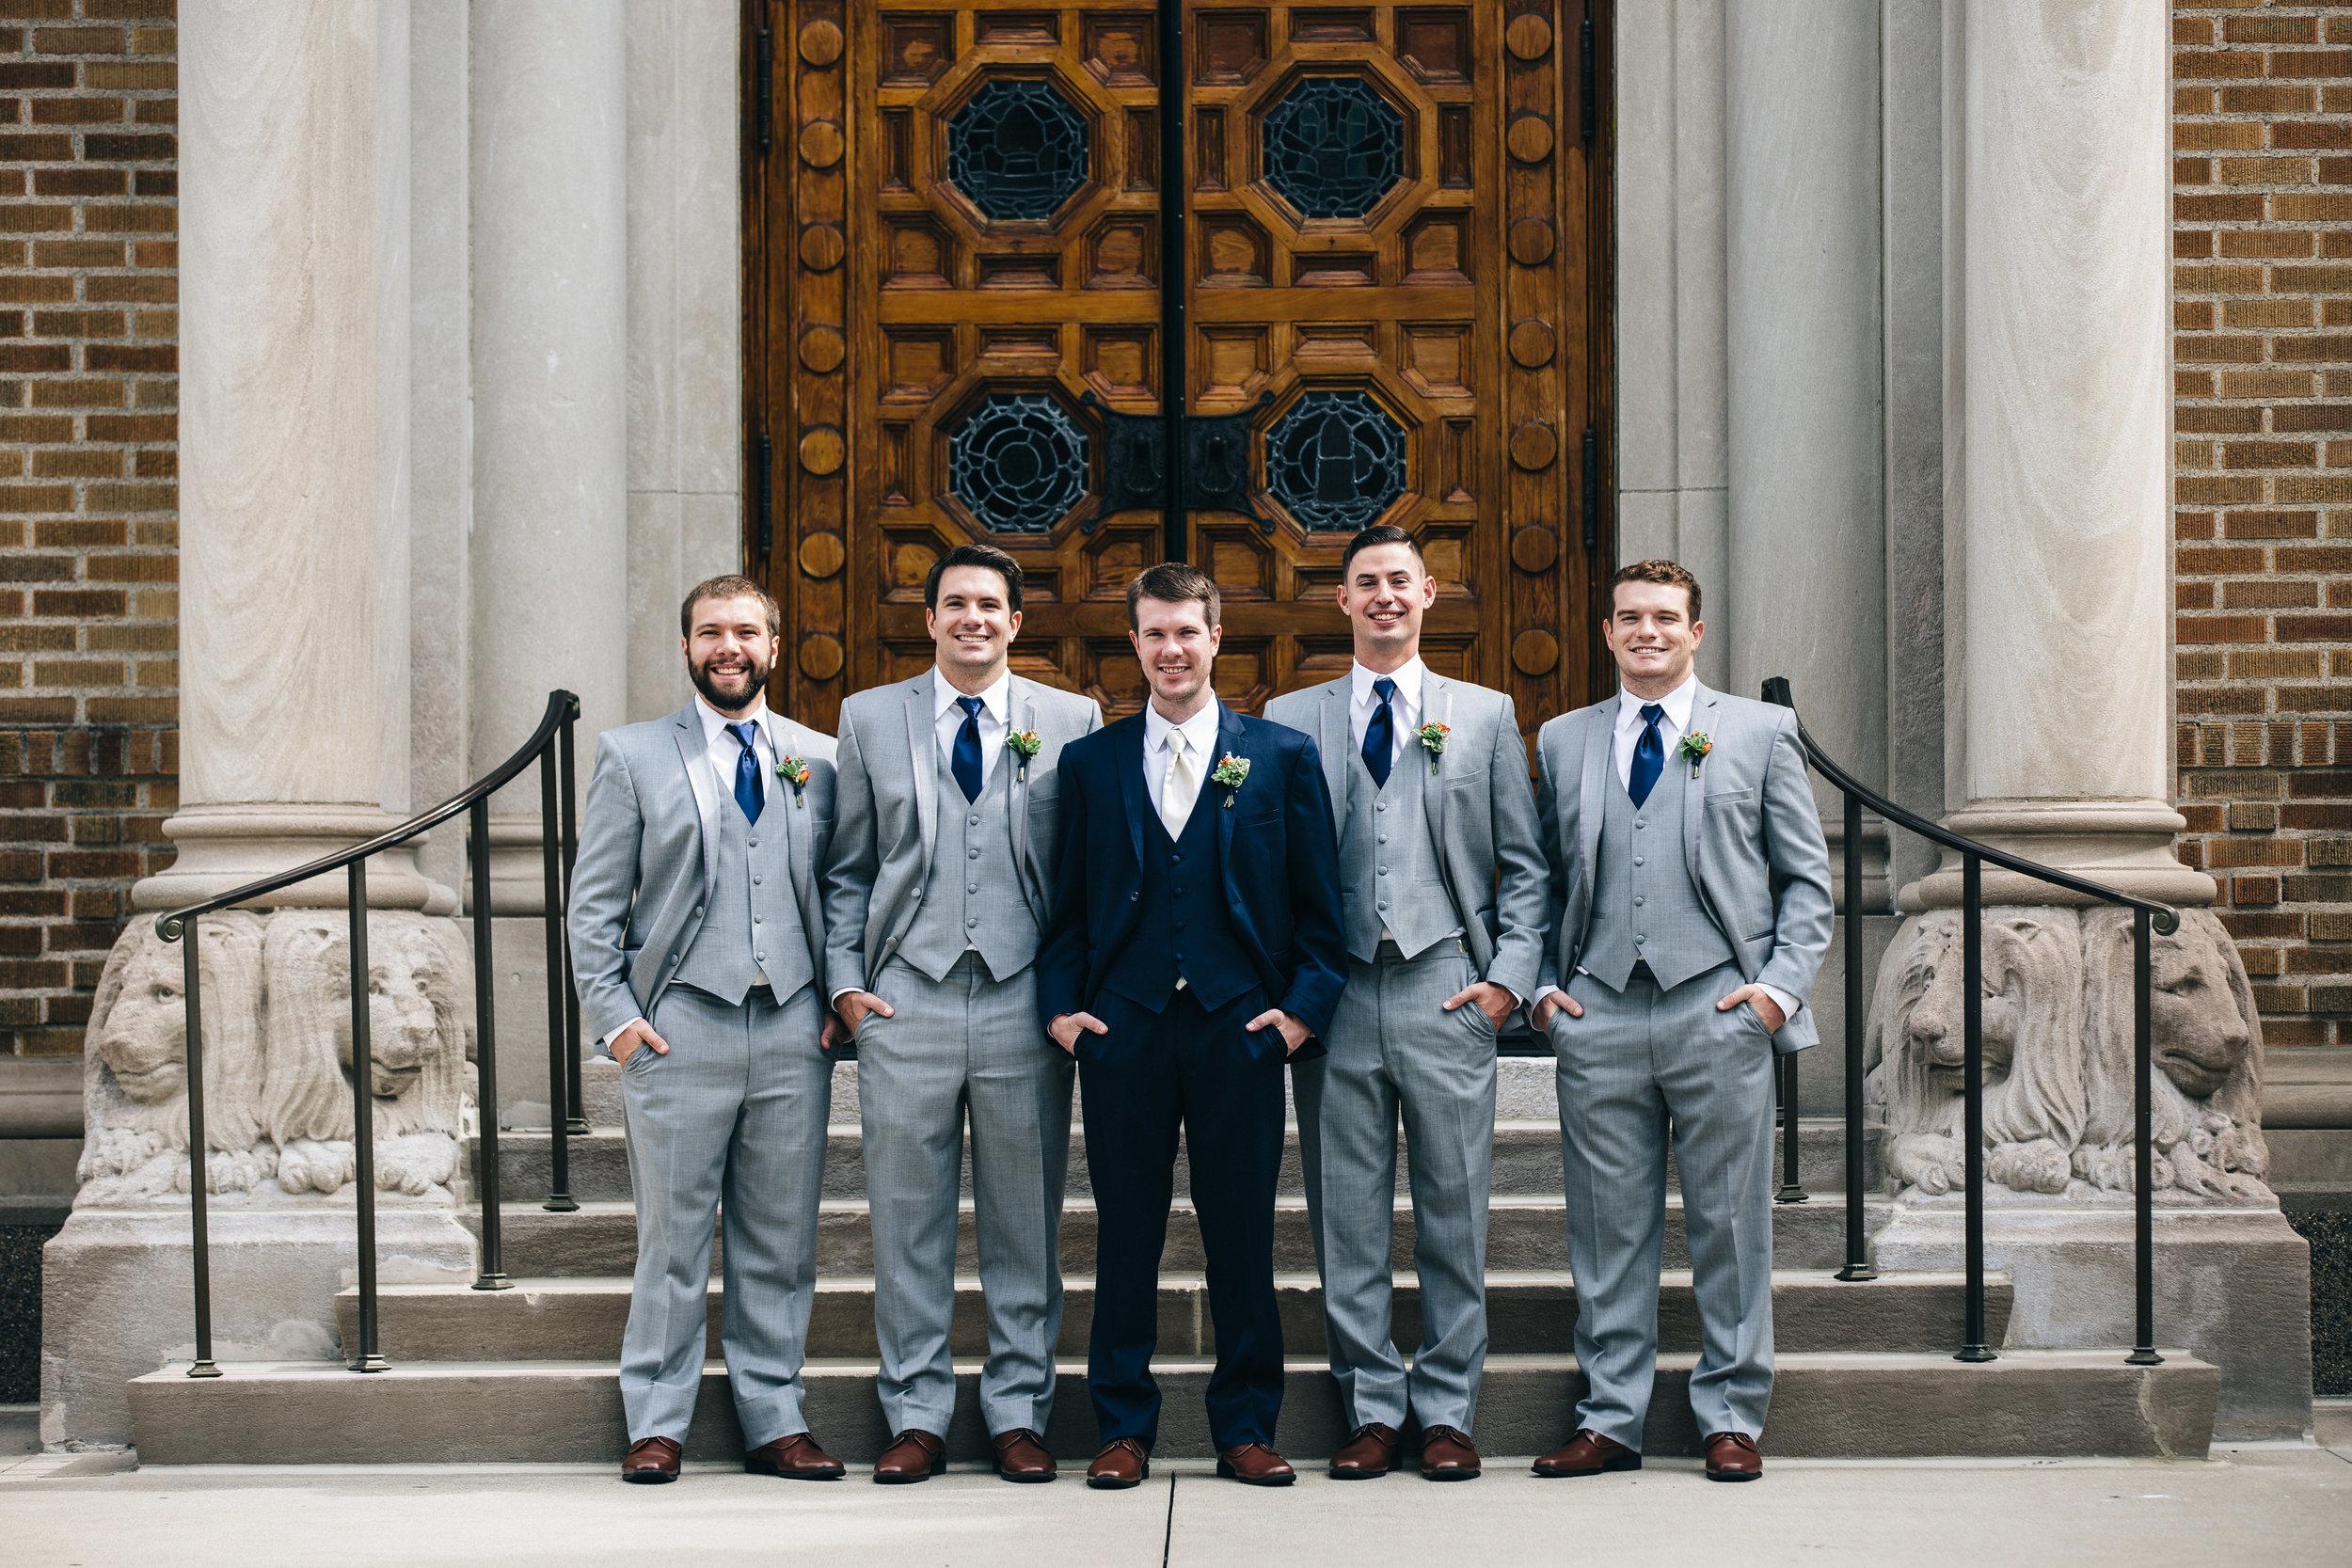 Wedding photography groomsmen inspiration